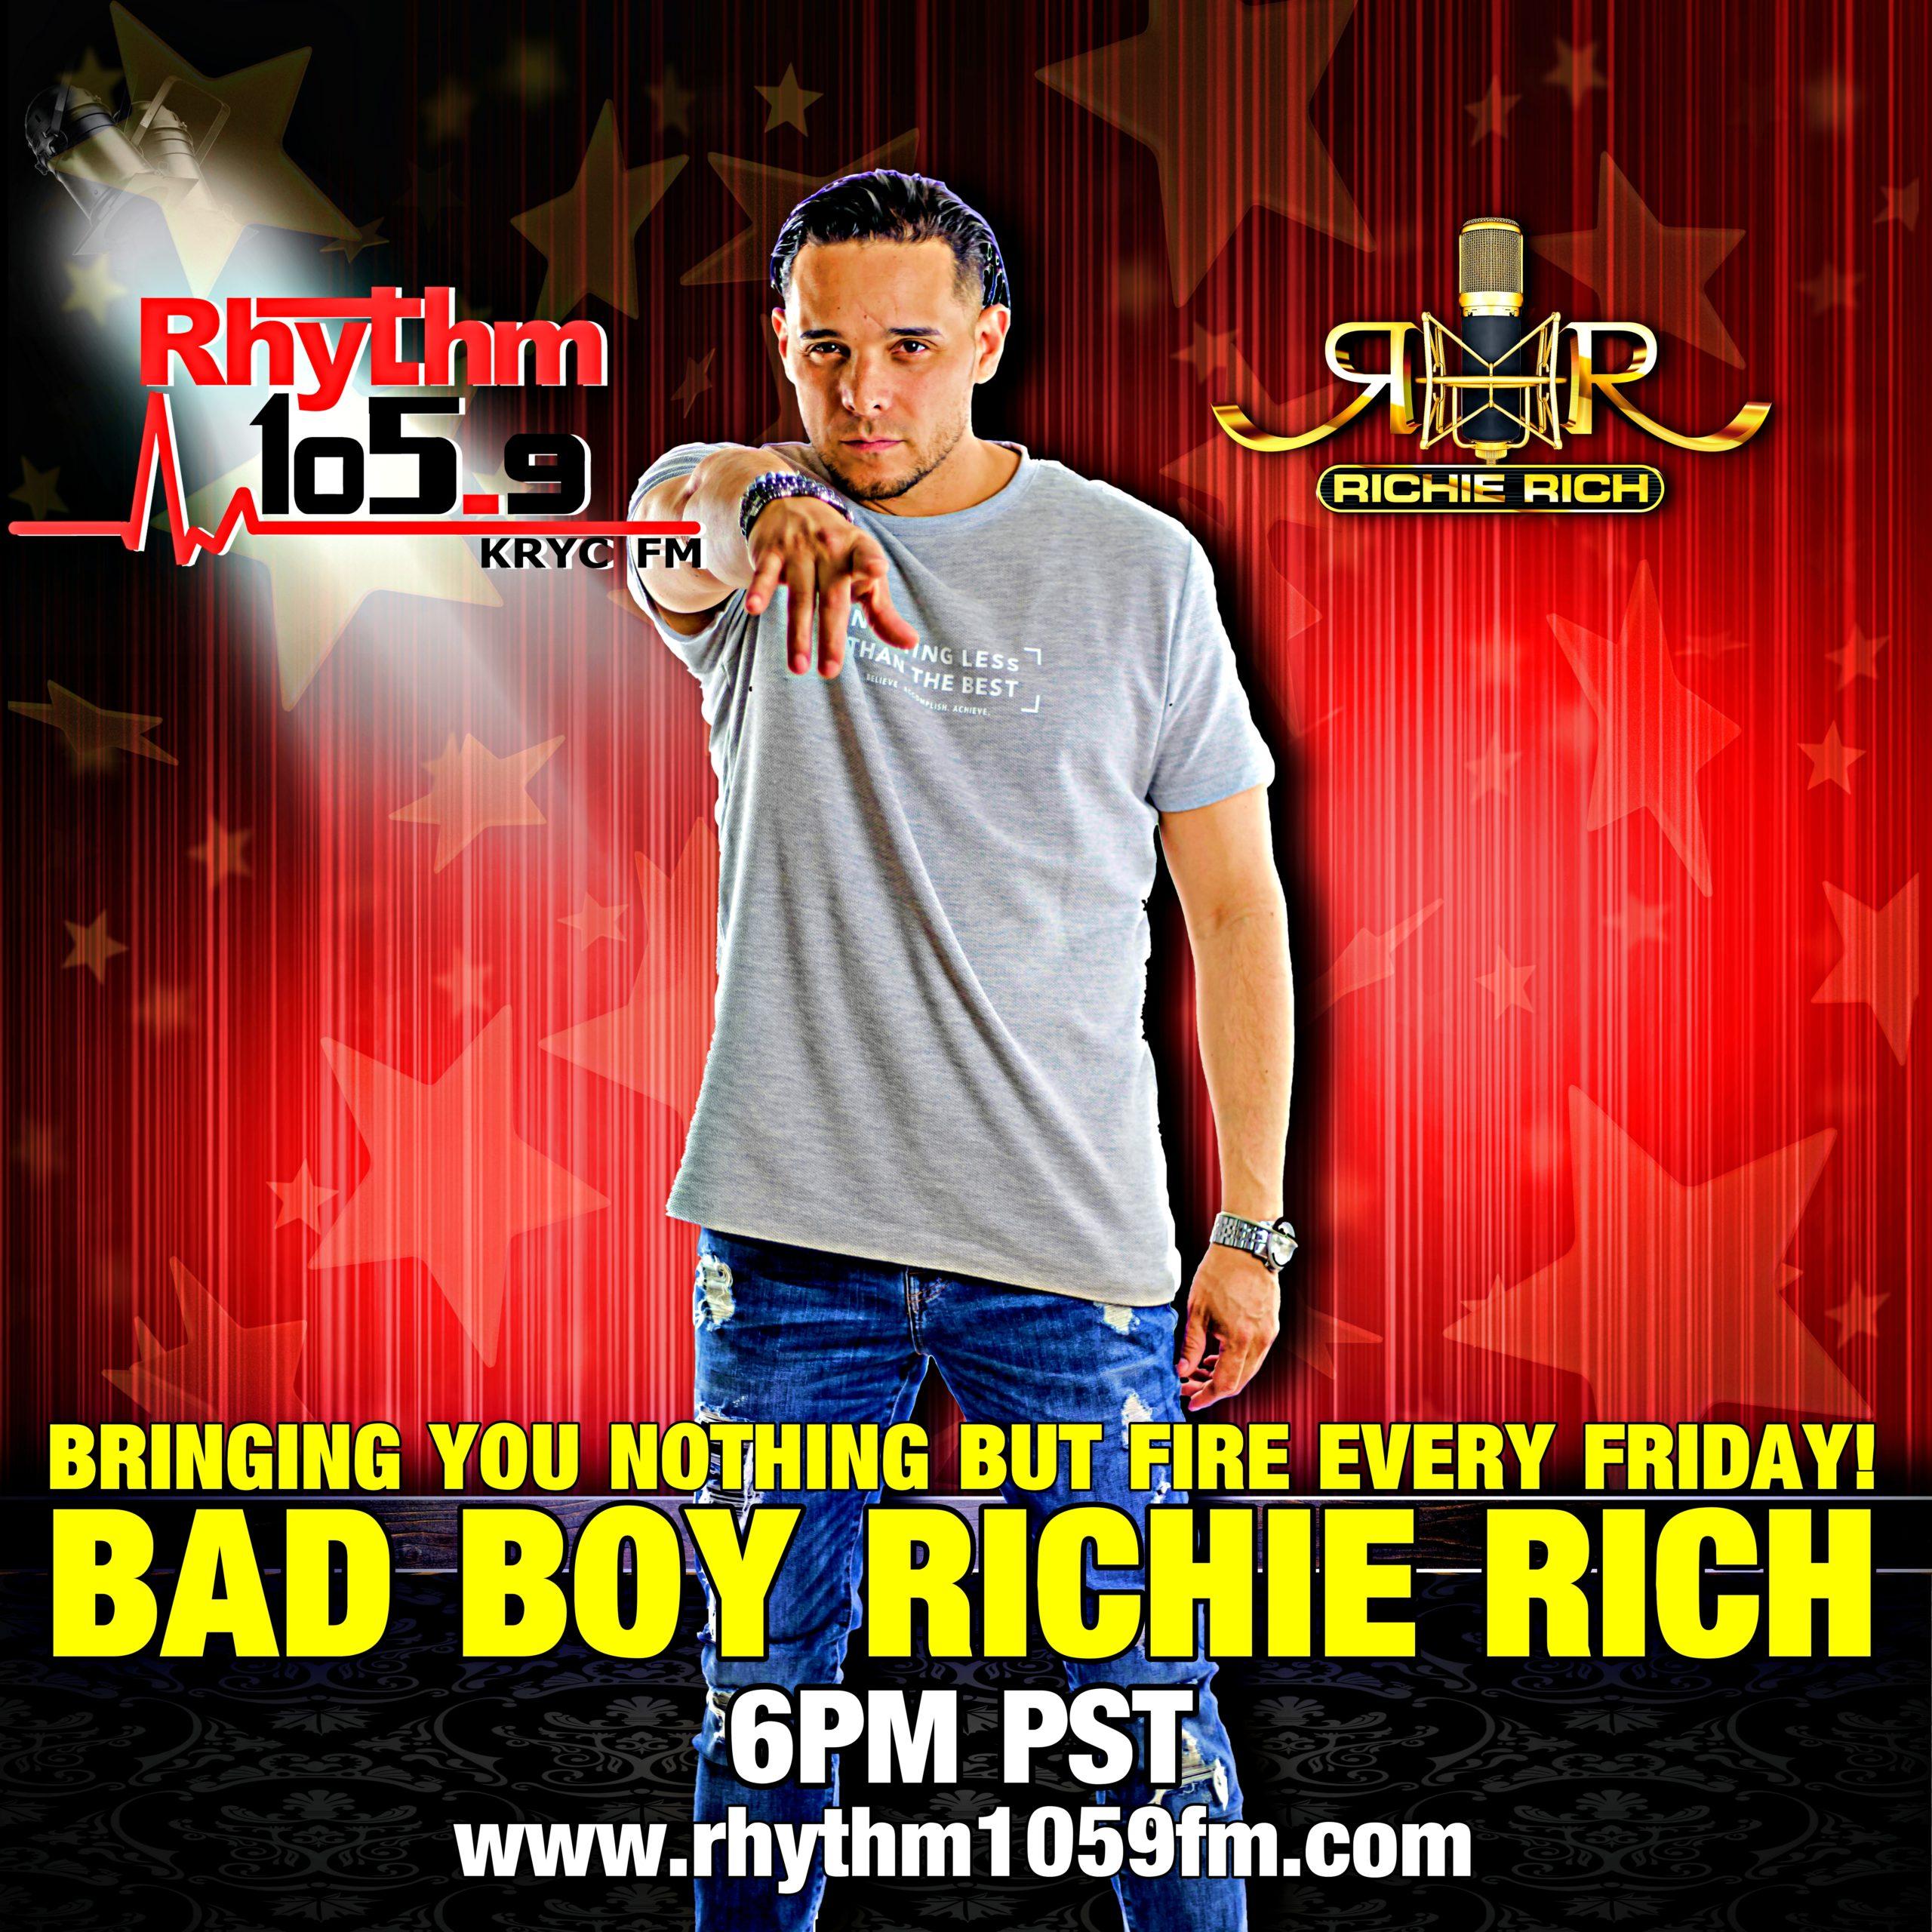 Bad Boy Richie Rich